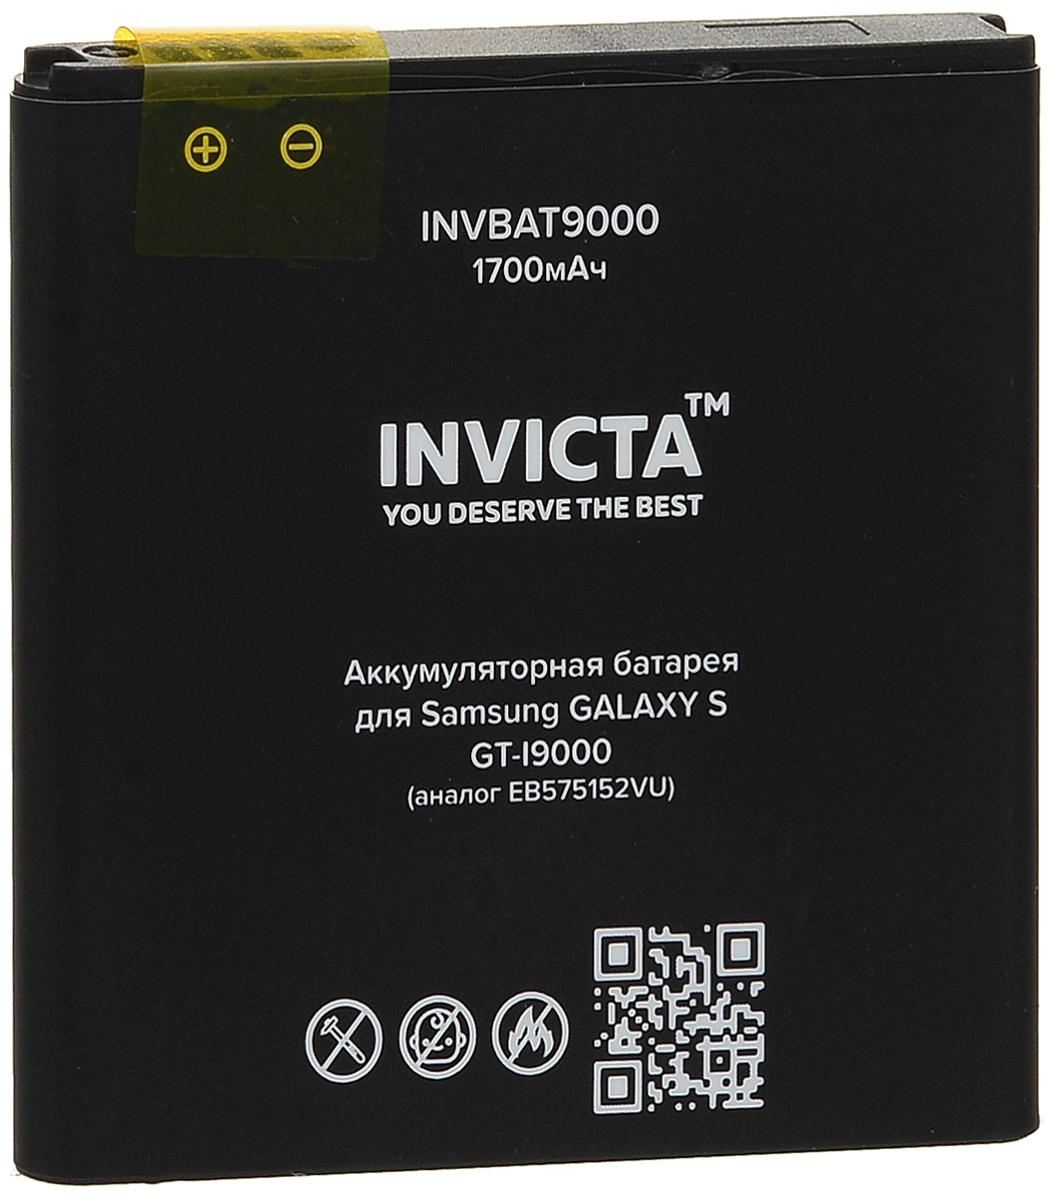 Invicta INVBAT9000, Black аккумулятор для Samsung GT-I9000 Galaxy S аналог EB575152VU (1700мАч)